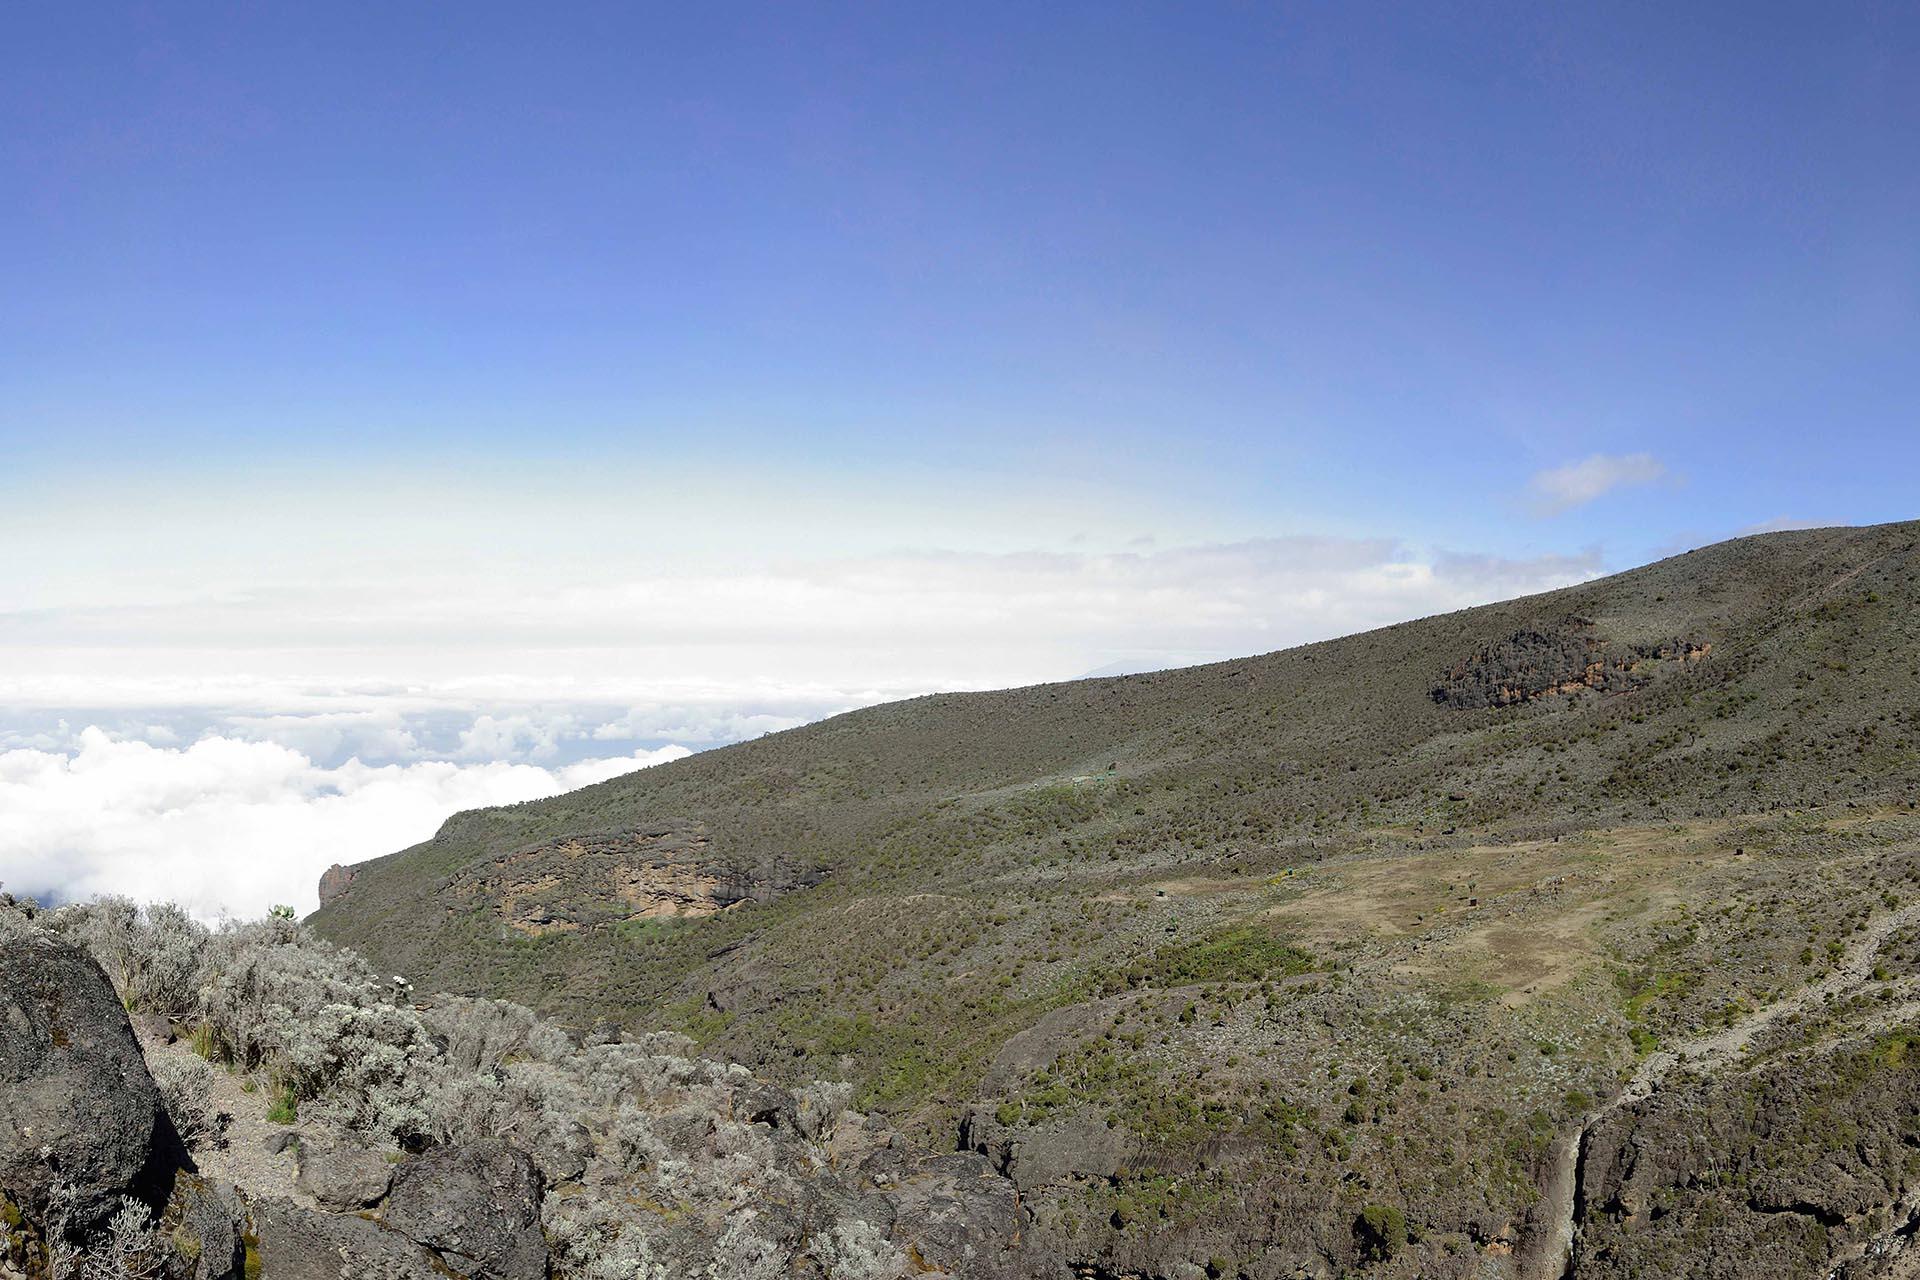 trekking-itineraries-maasai-wanderings-safari-itineraries-signature-photo-safaris-africa